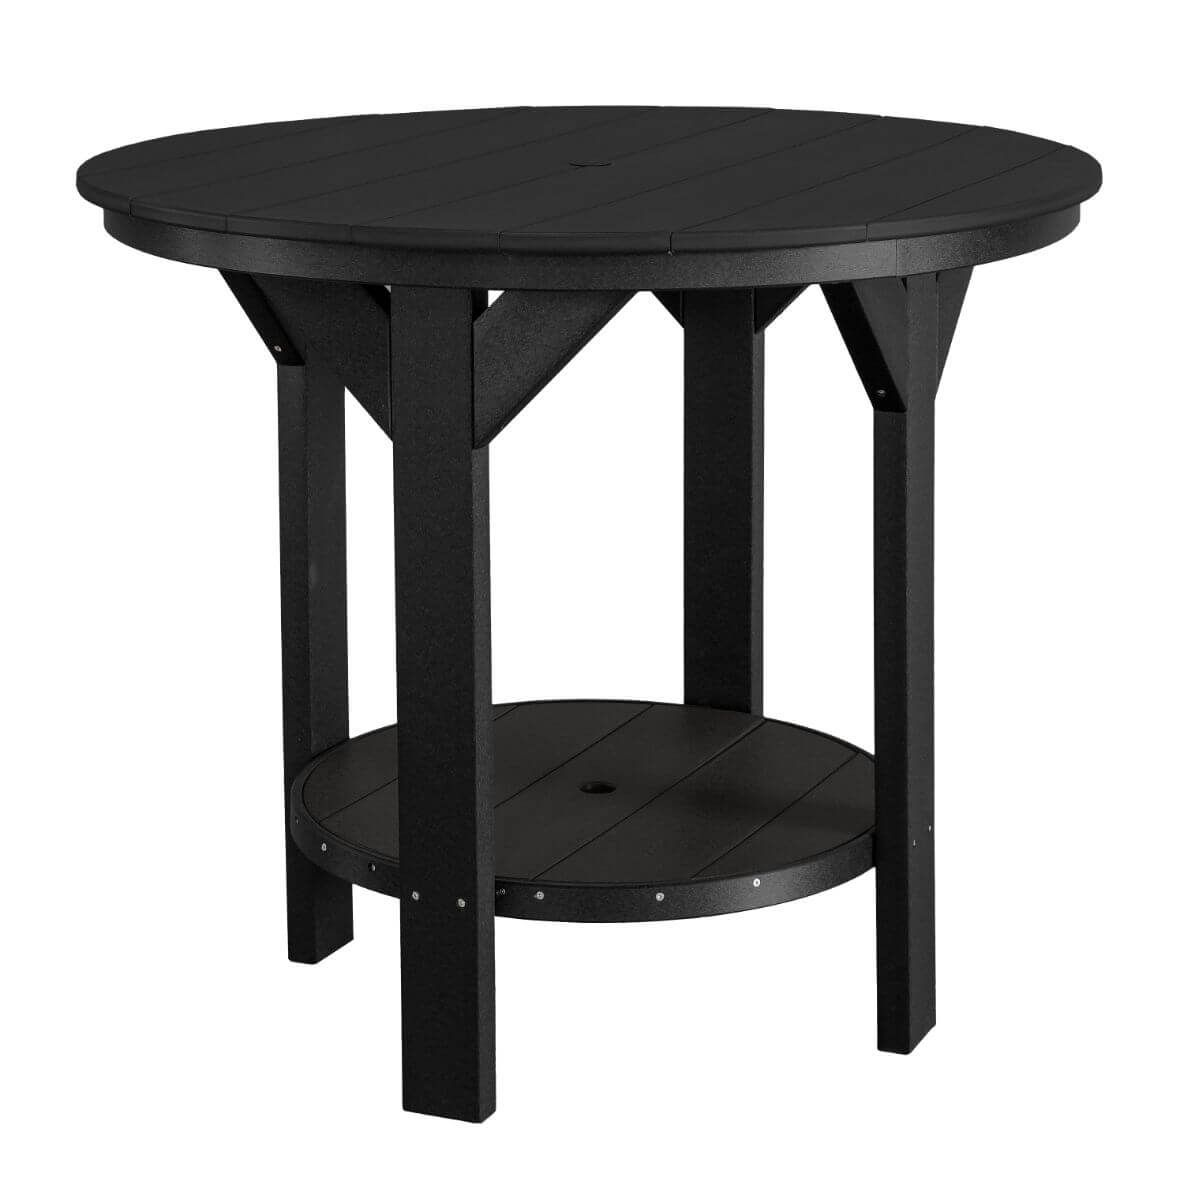 Black Sidra Outdoor Pub Table